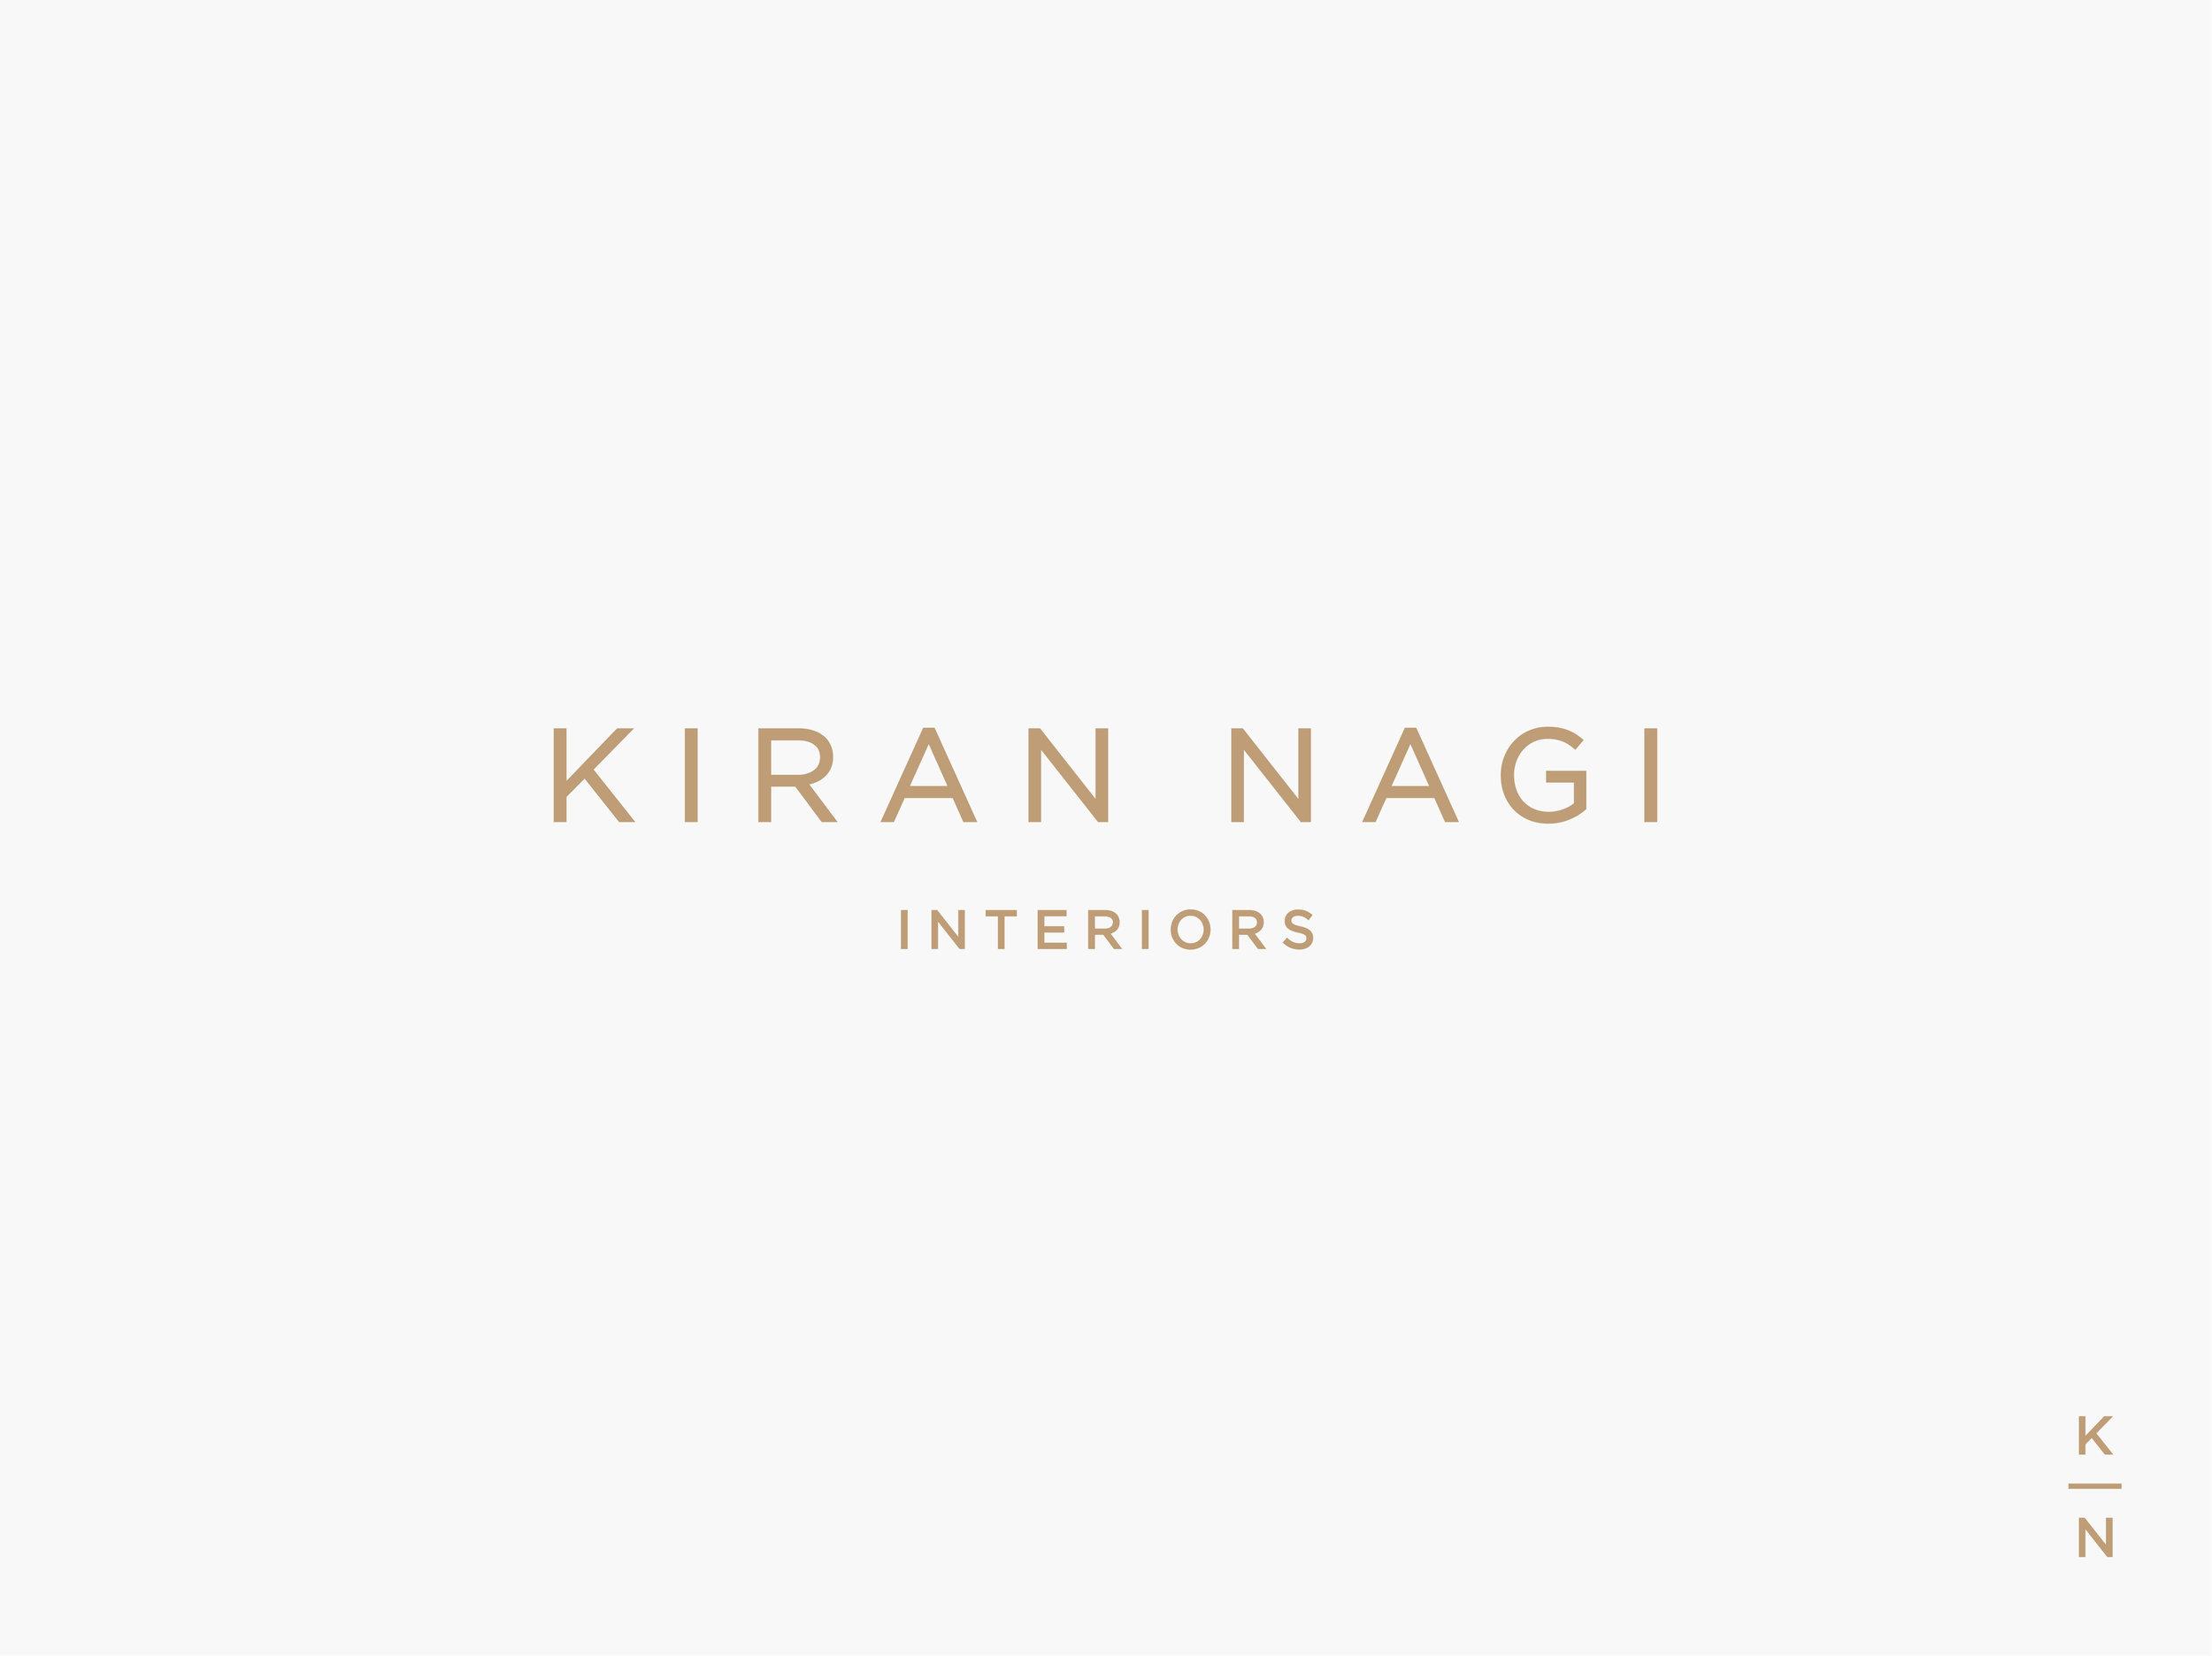 FlintHouse_KiranNagi_Logos-02.jpg